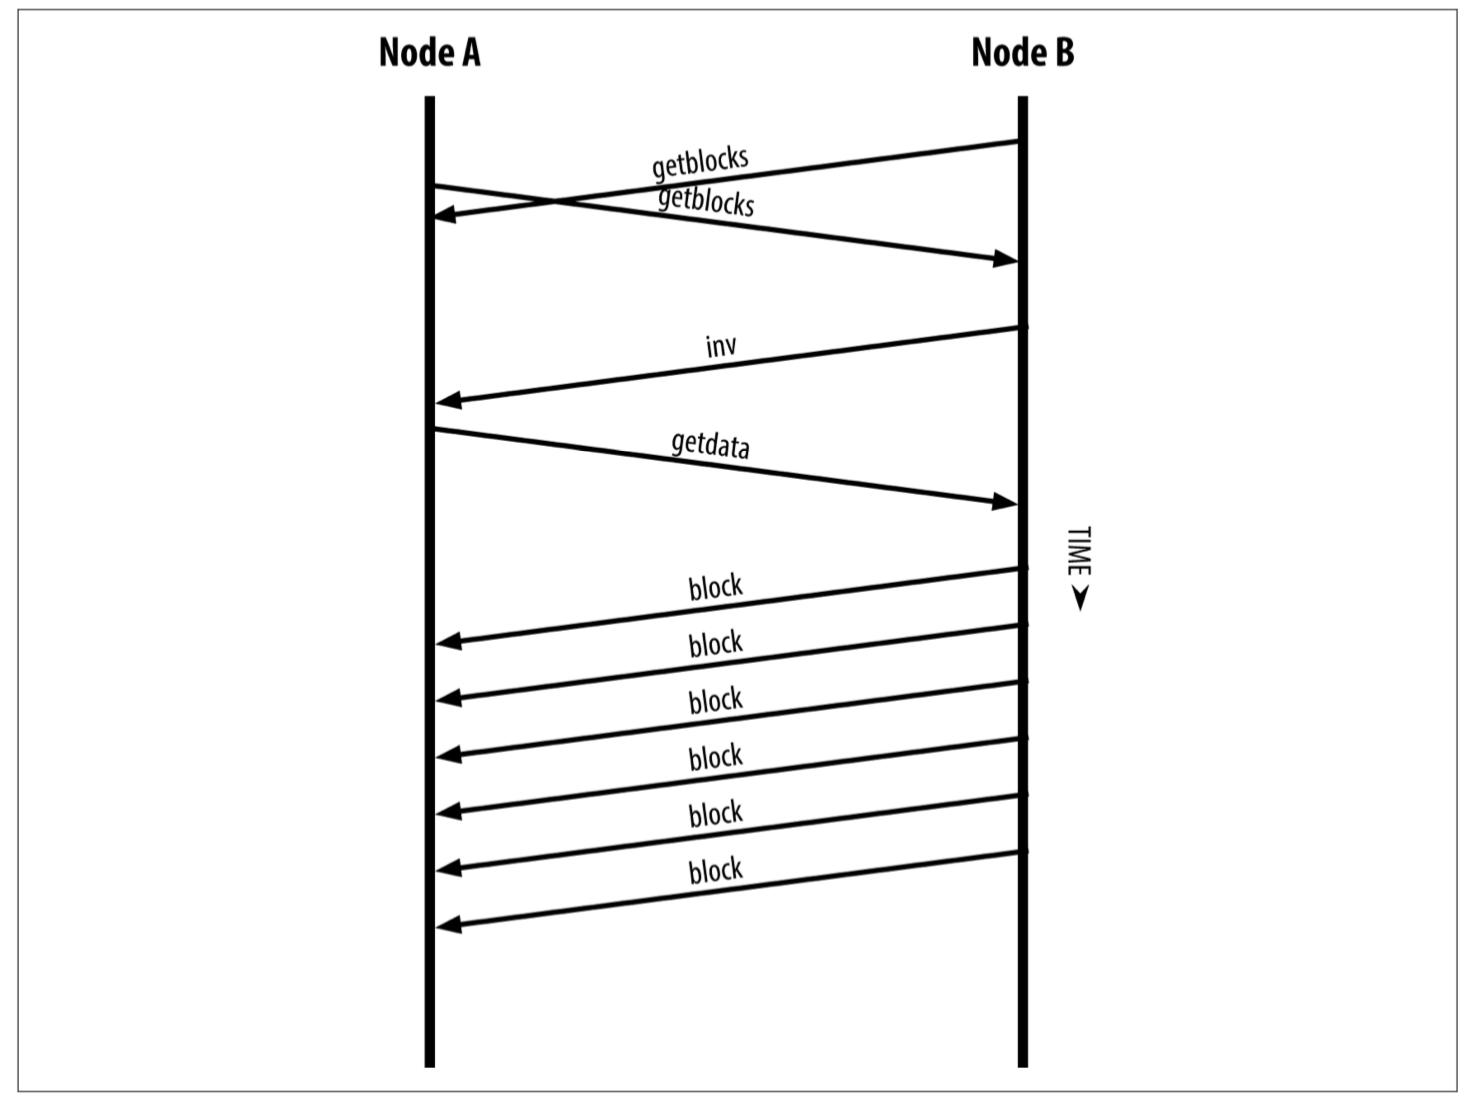 同步区块链数据.png-158.7kB